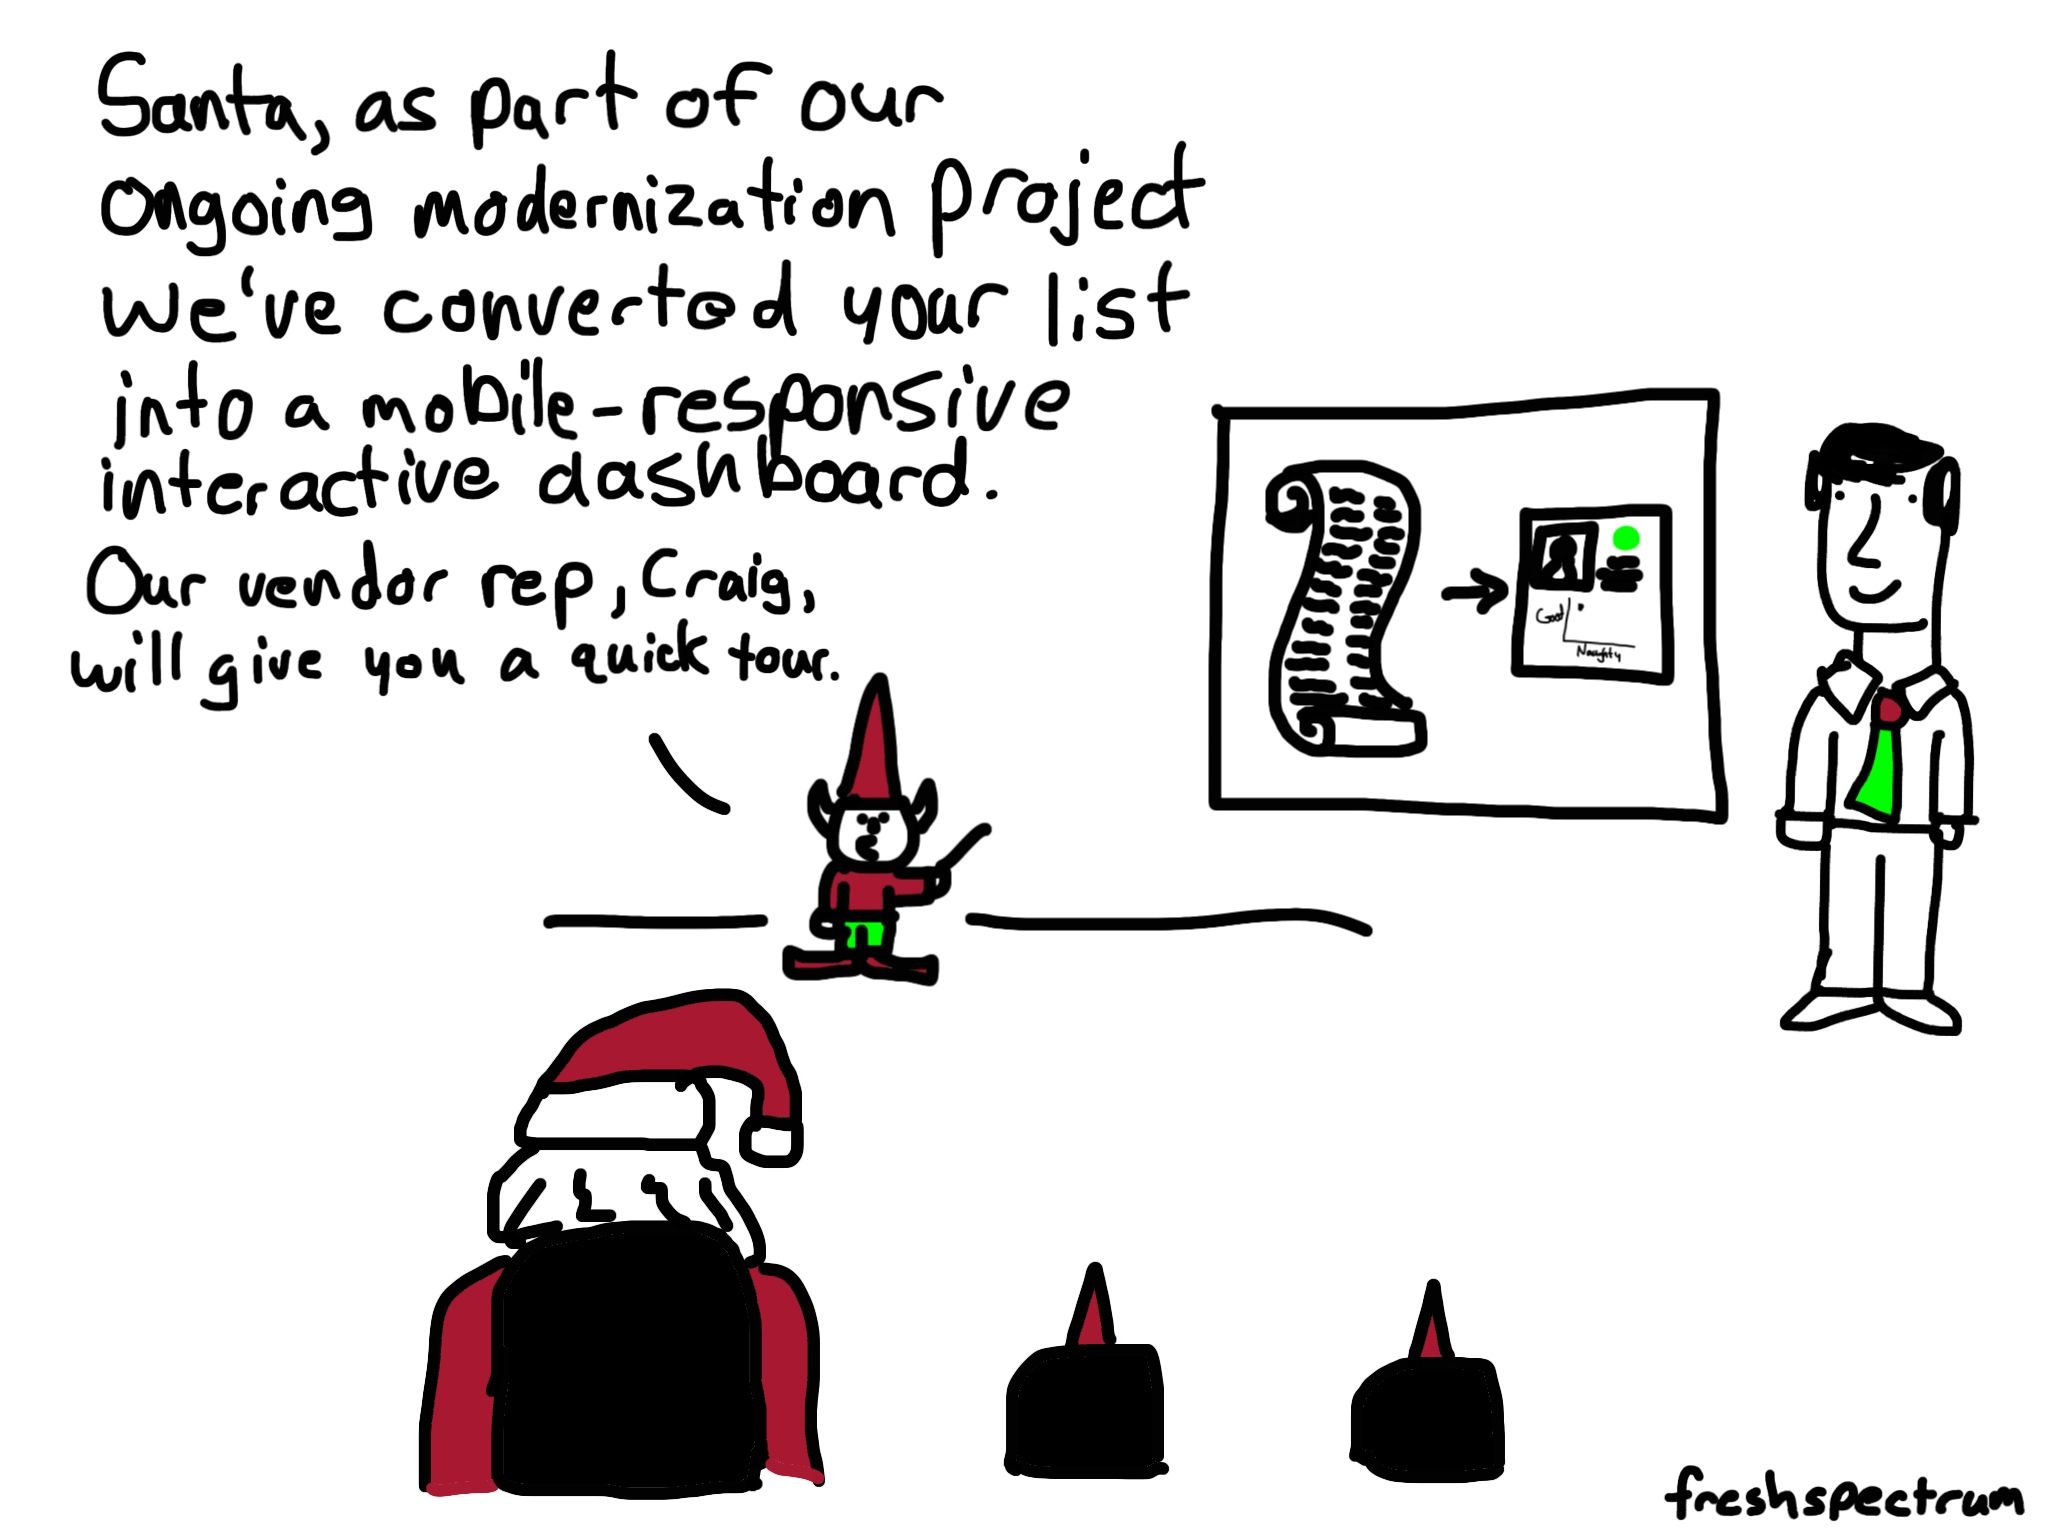 Santa's interactive dashboard cartoon by Chris Lysy